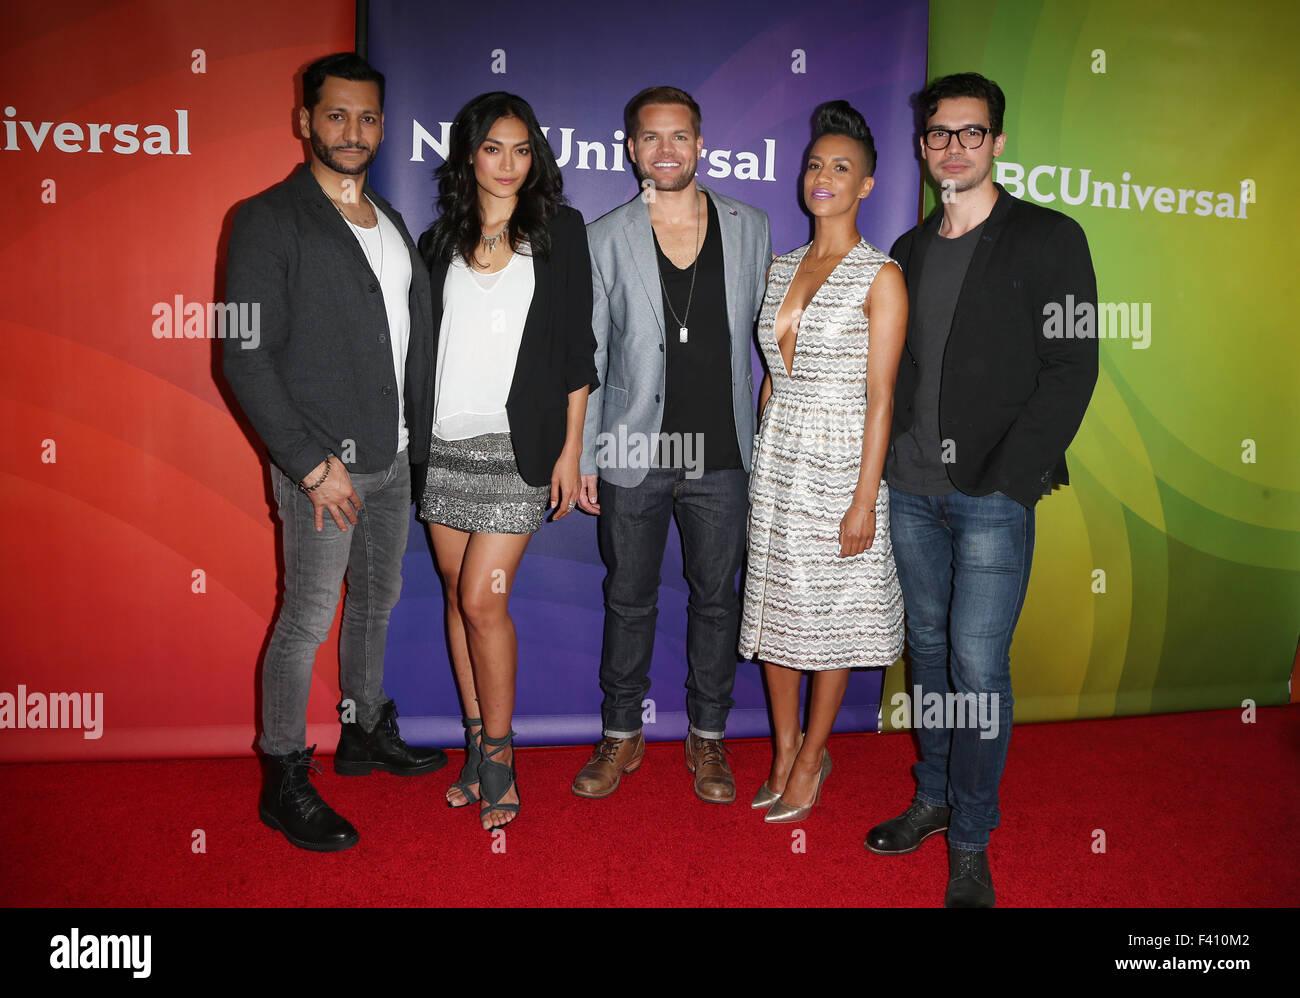 NBC Universal 2015 Summer Press Tour Featuring: Cas Anvar